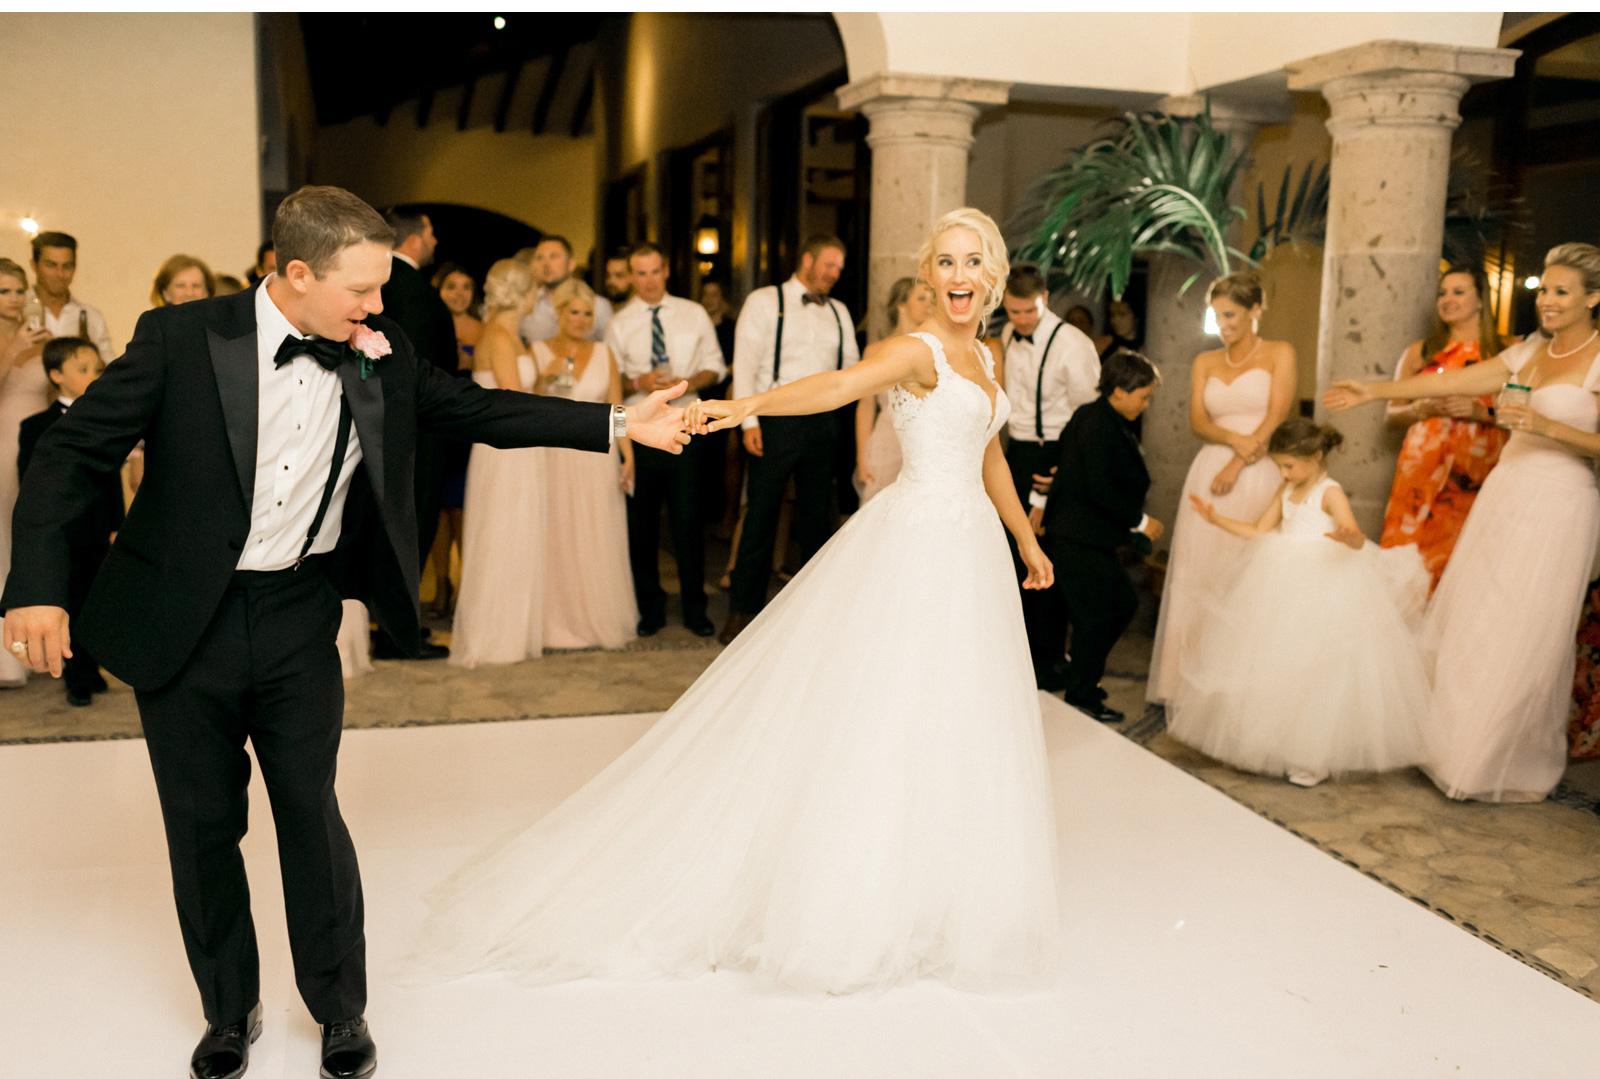 Cabo-Destination-Wedding-Natalie-Schutt-Photography_14.jpg